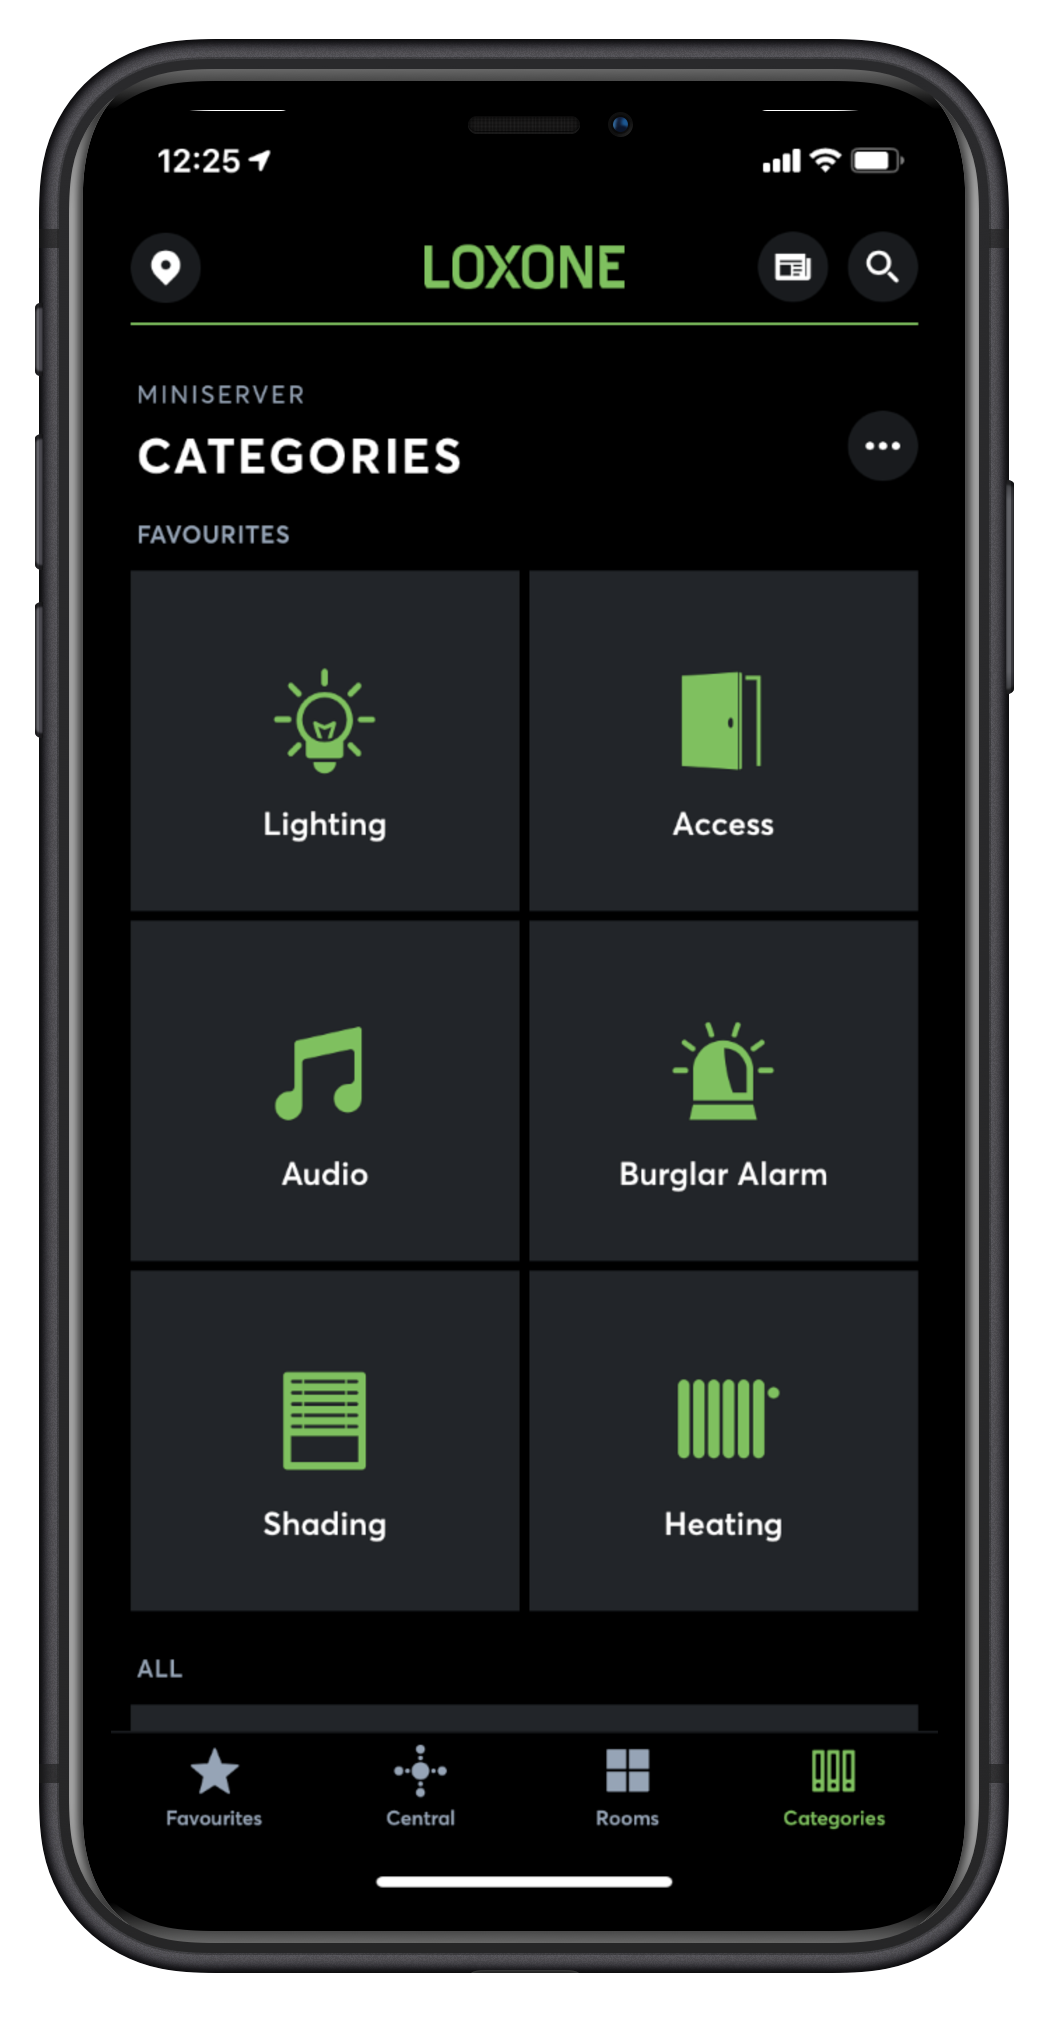 iPhone Loxone App Categories